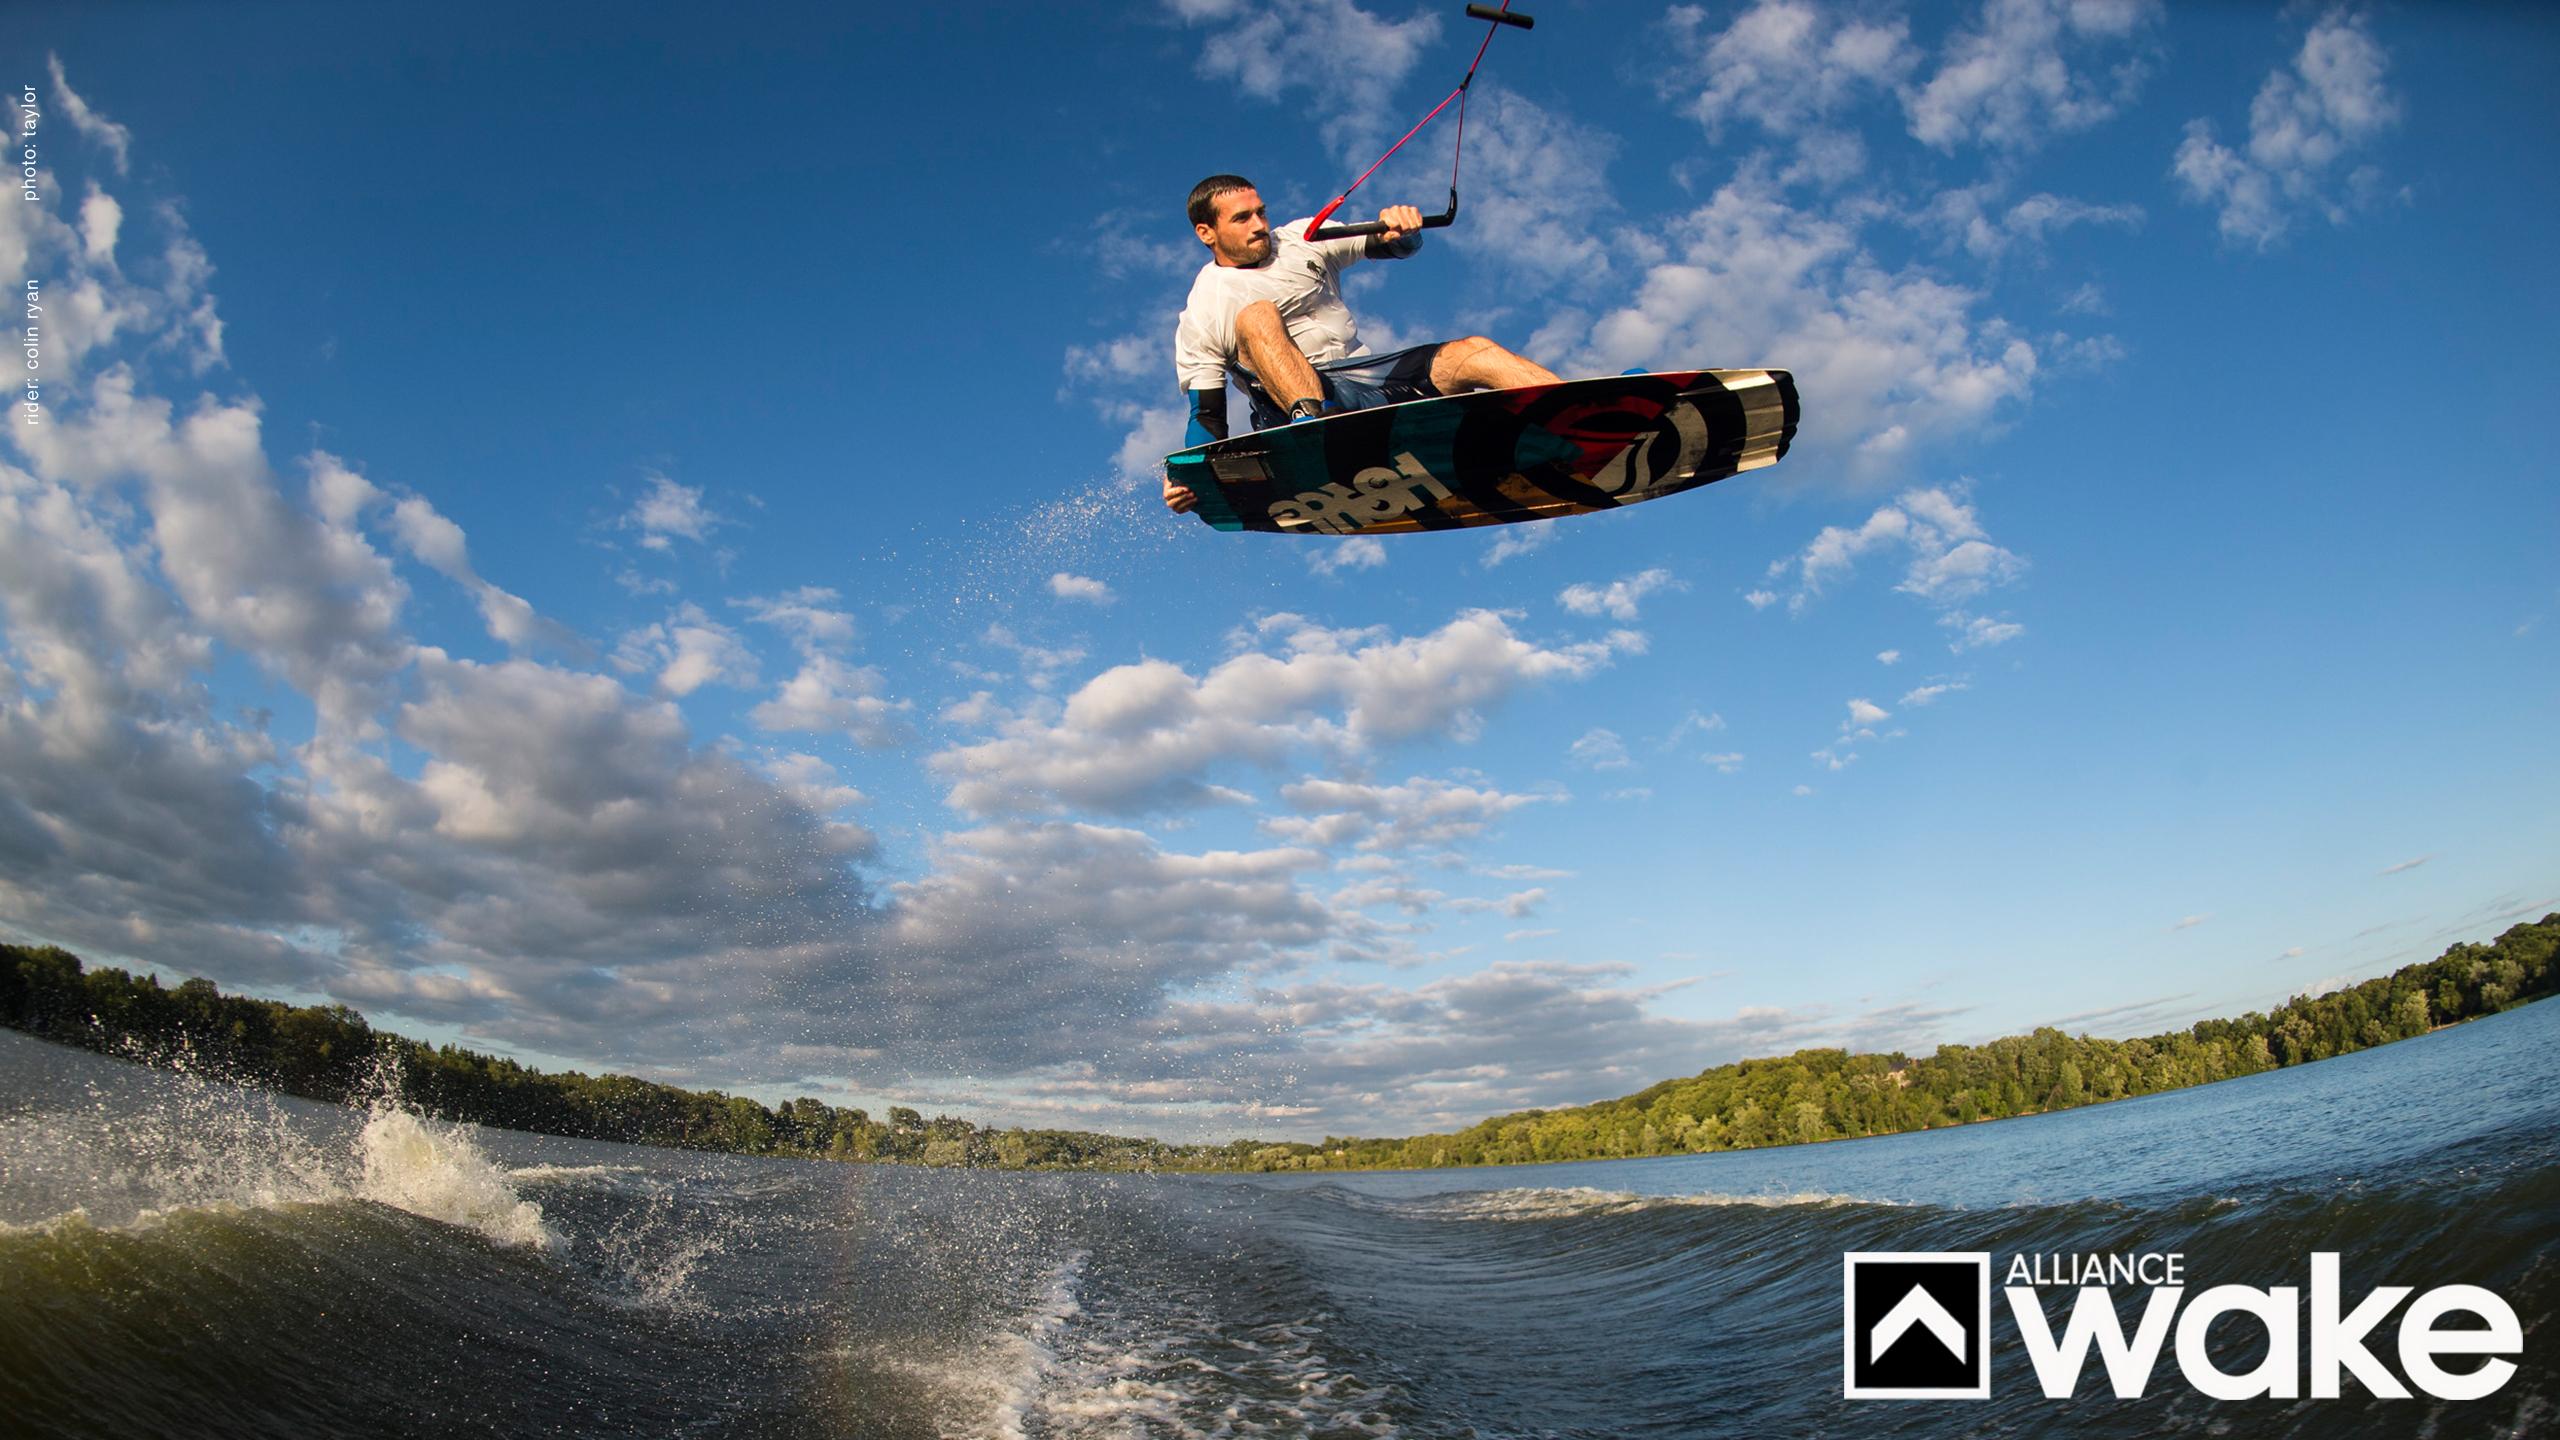 Wakeboarding Boat Wallpaper Wallpapers: January.4 ...